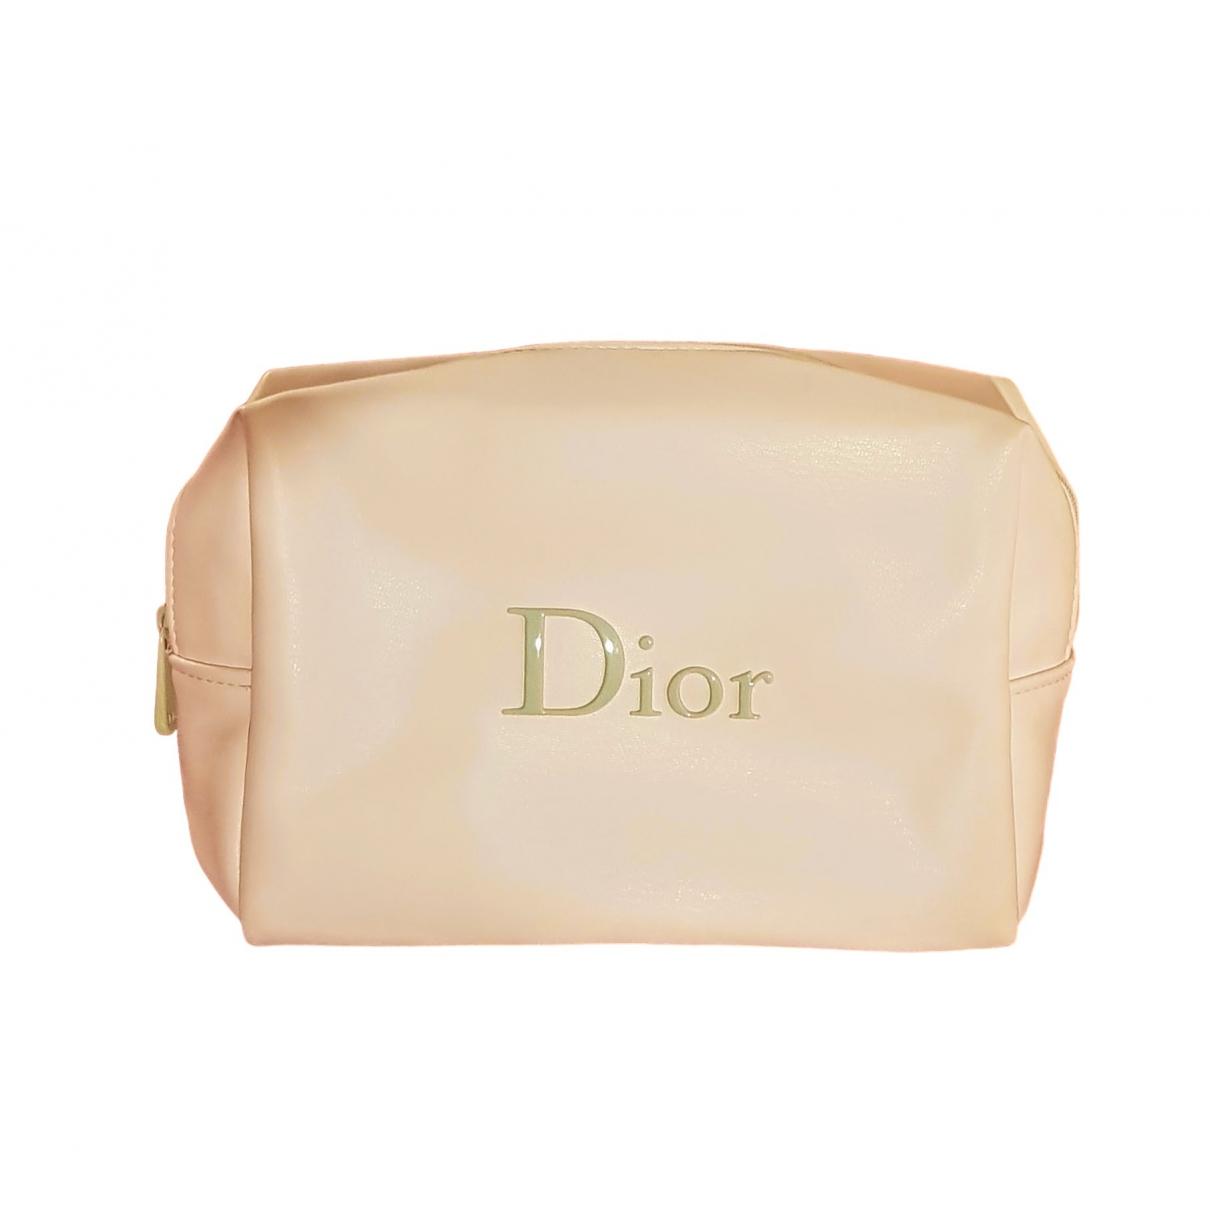 Dior - Sac de voyage   pour femme - ecru